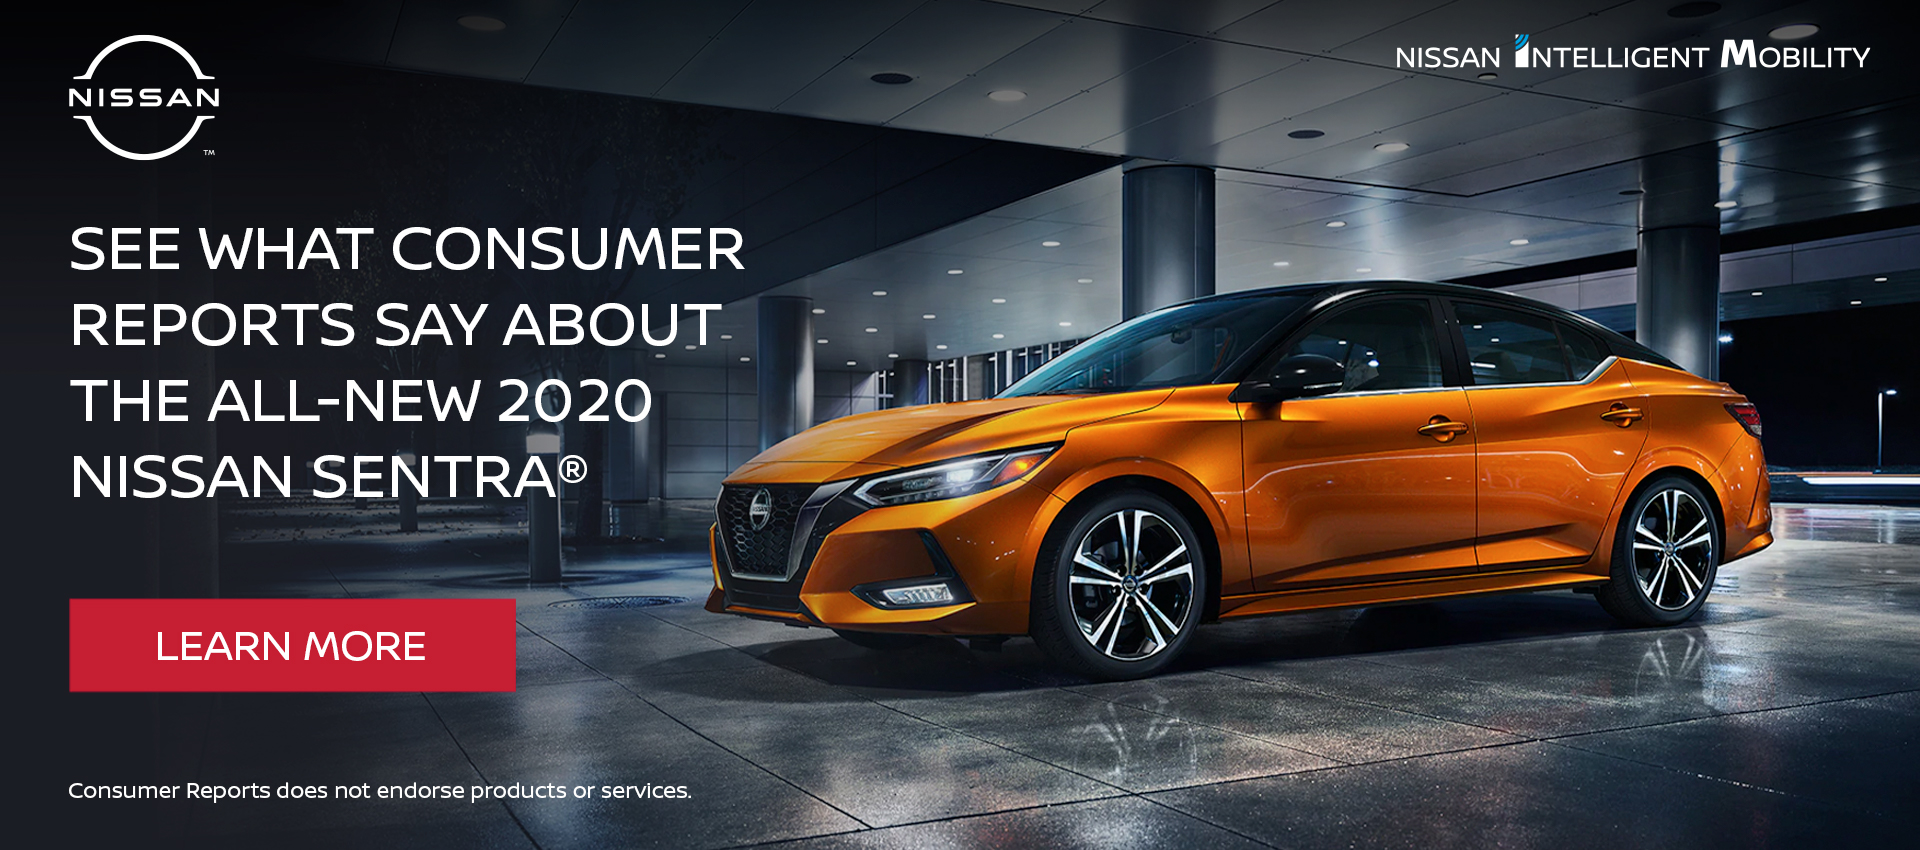 Mossy Nissan - 2020 Sentra